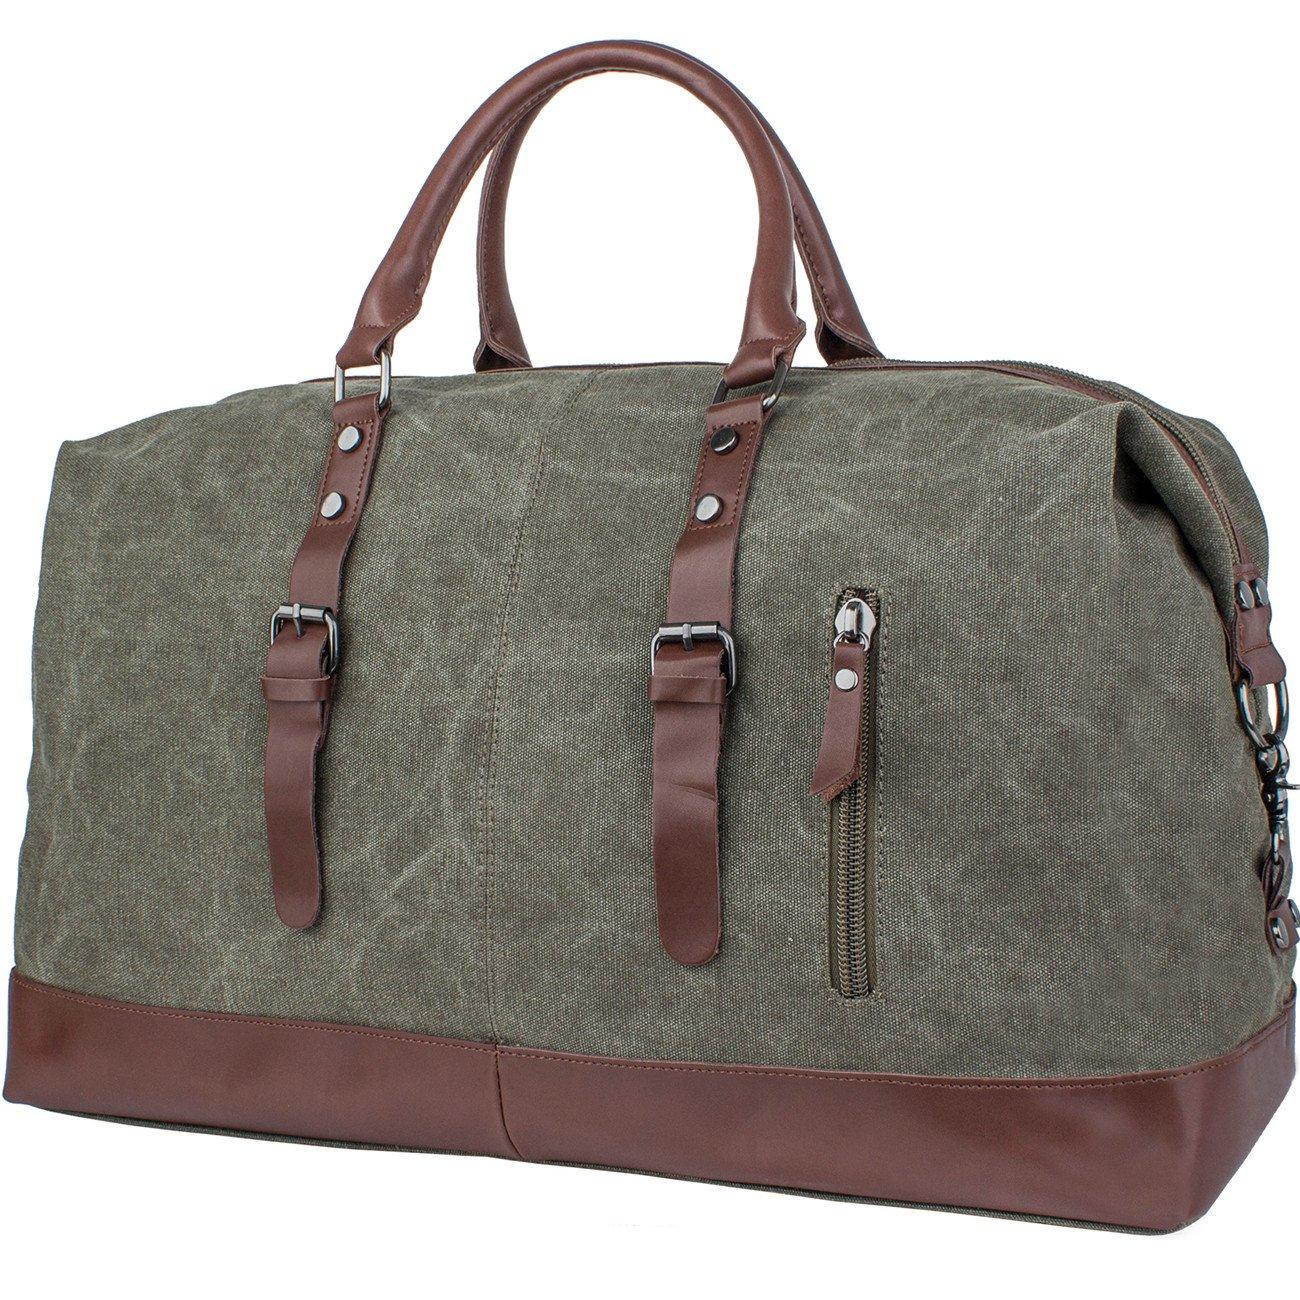 Leaper Canvas Leather Trim Shoulder Bag/Tote Handbag/Cross-body Bag/ Messenger Bag/Duffel Travel Bag (Army Green) Fifth Season BP3072